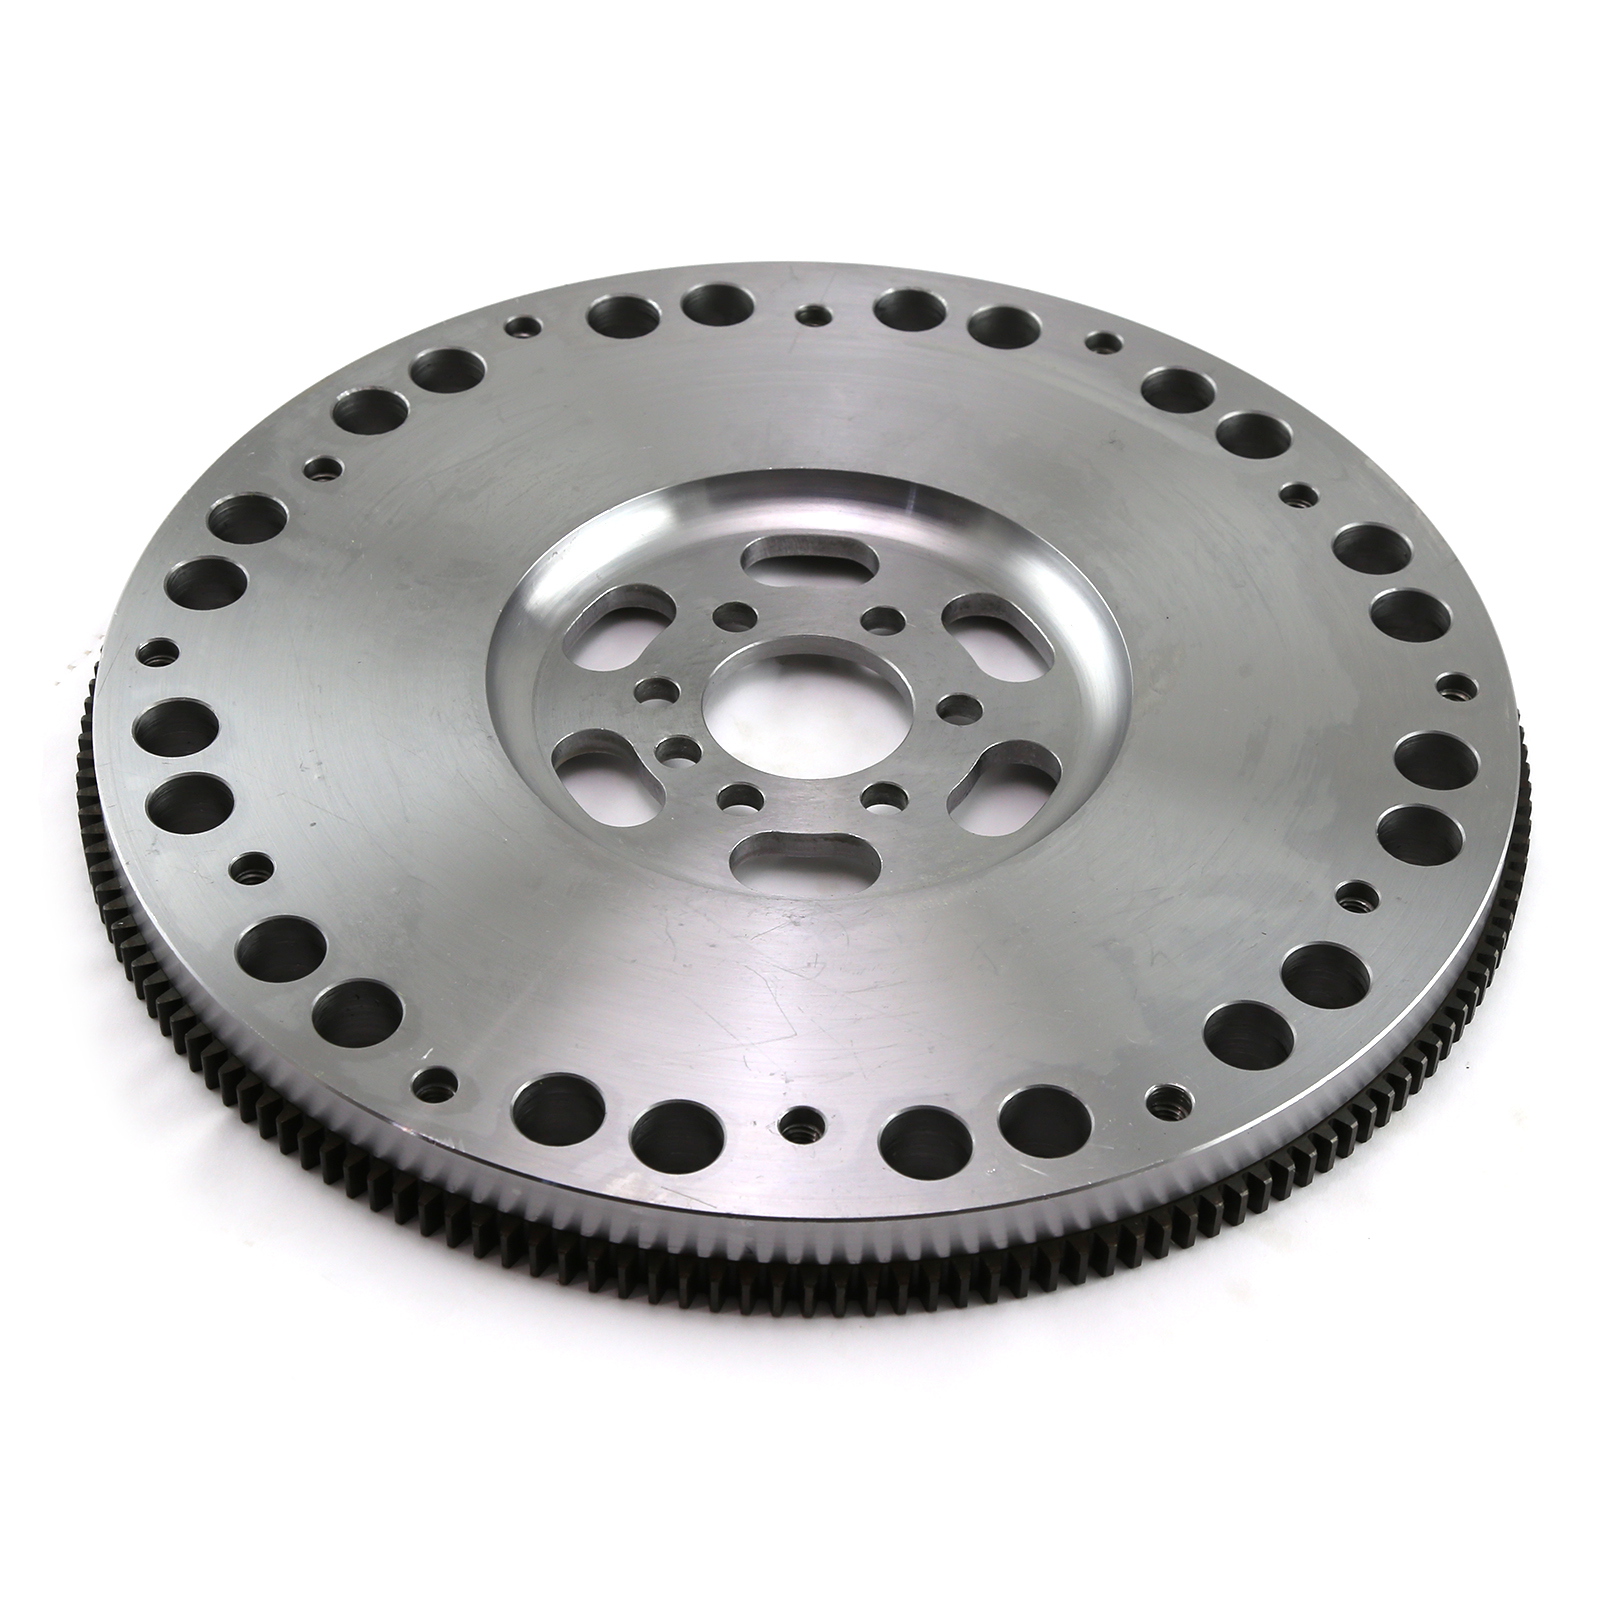 Ford SB 289 302 351W 351C 164 Tooth 28Oz Billet Steel Extra Light SFI Flywheel